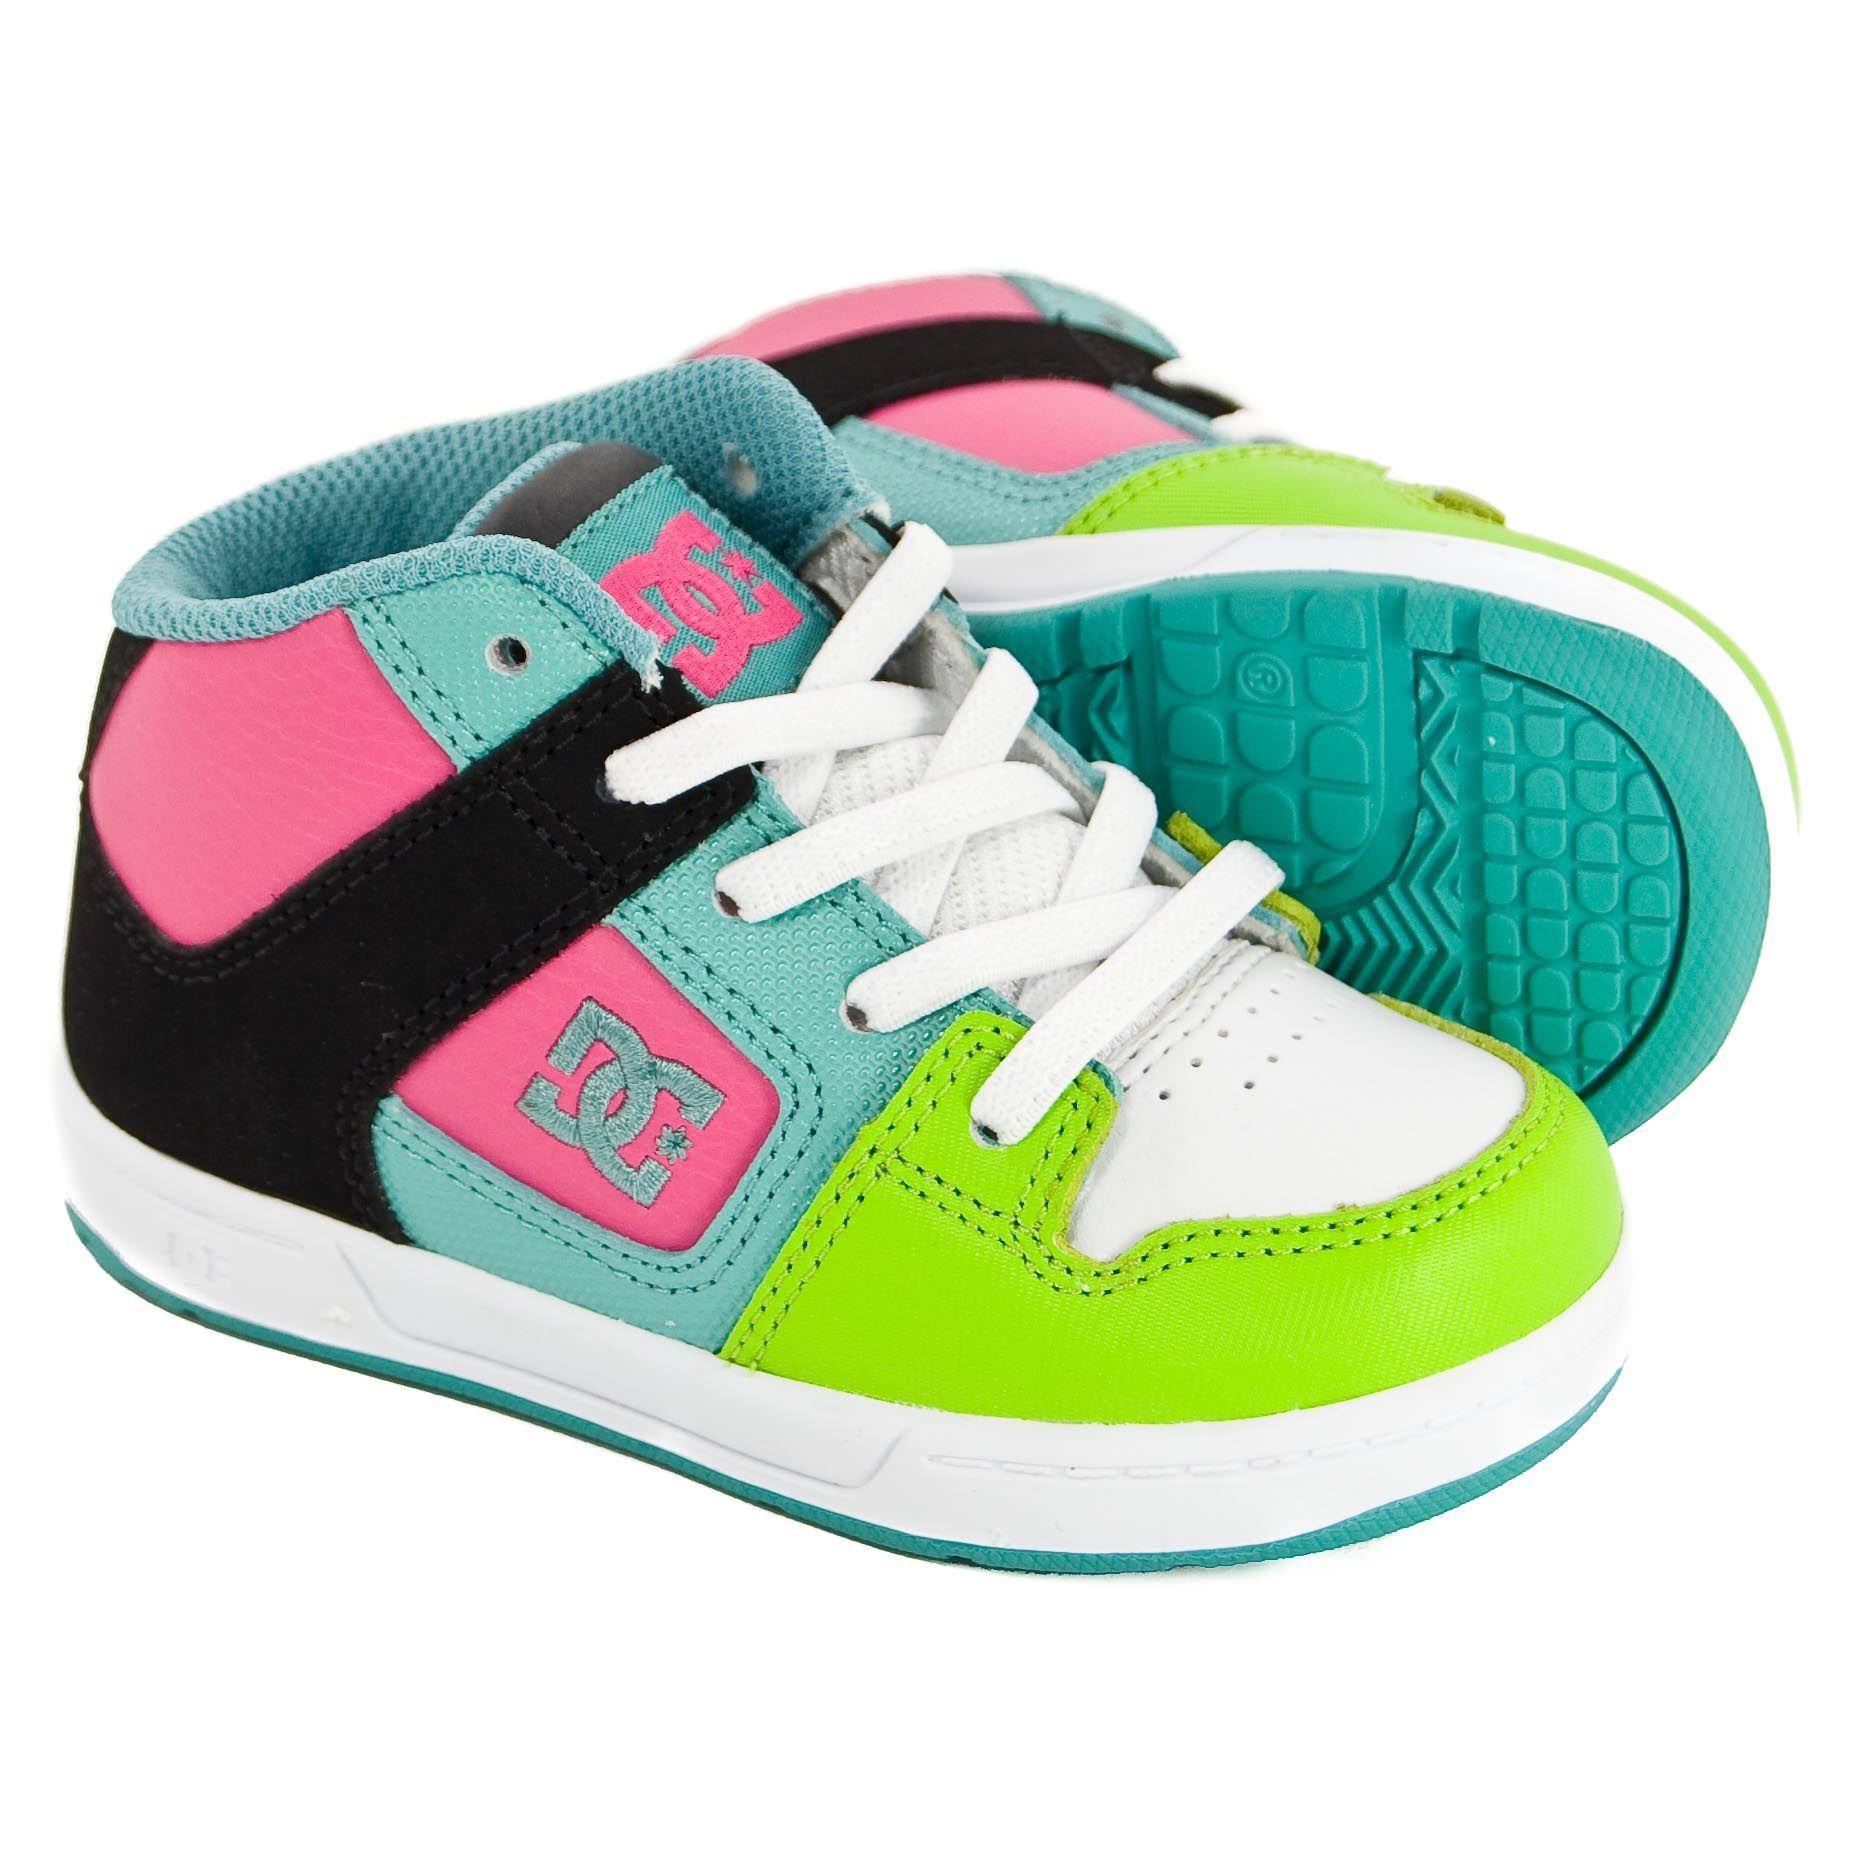 Kids Shoes | For Kids Shoes | Kids shoes online, Kids shoe ...